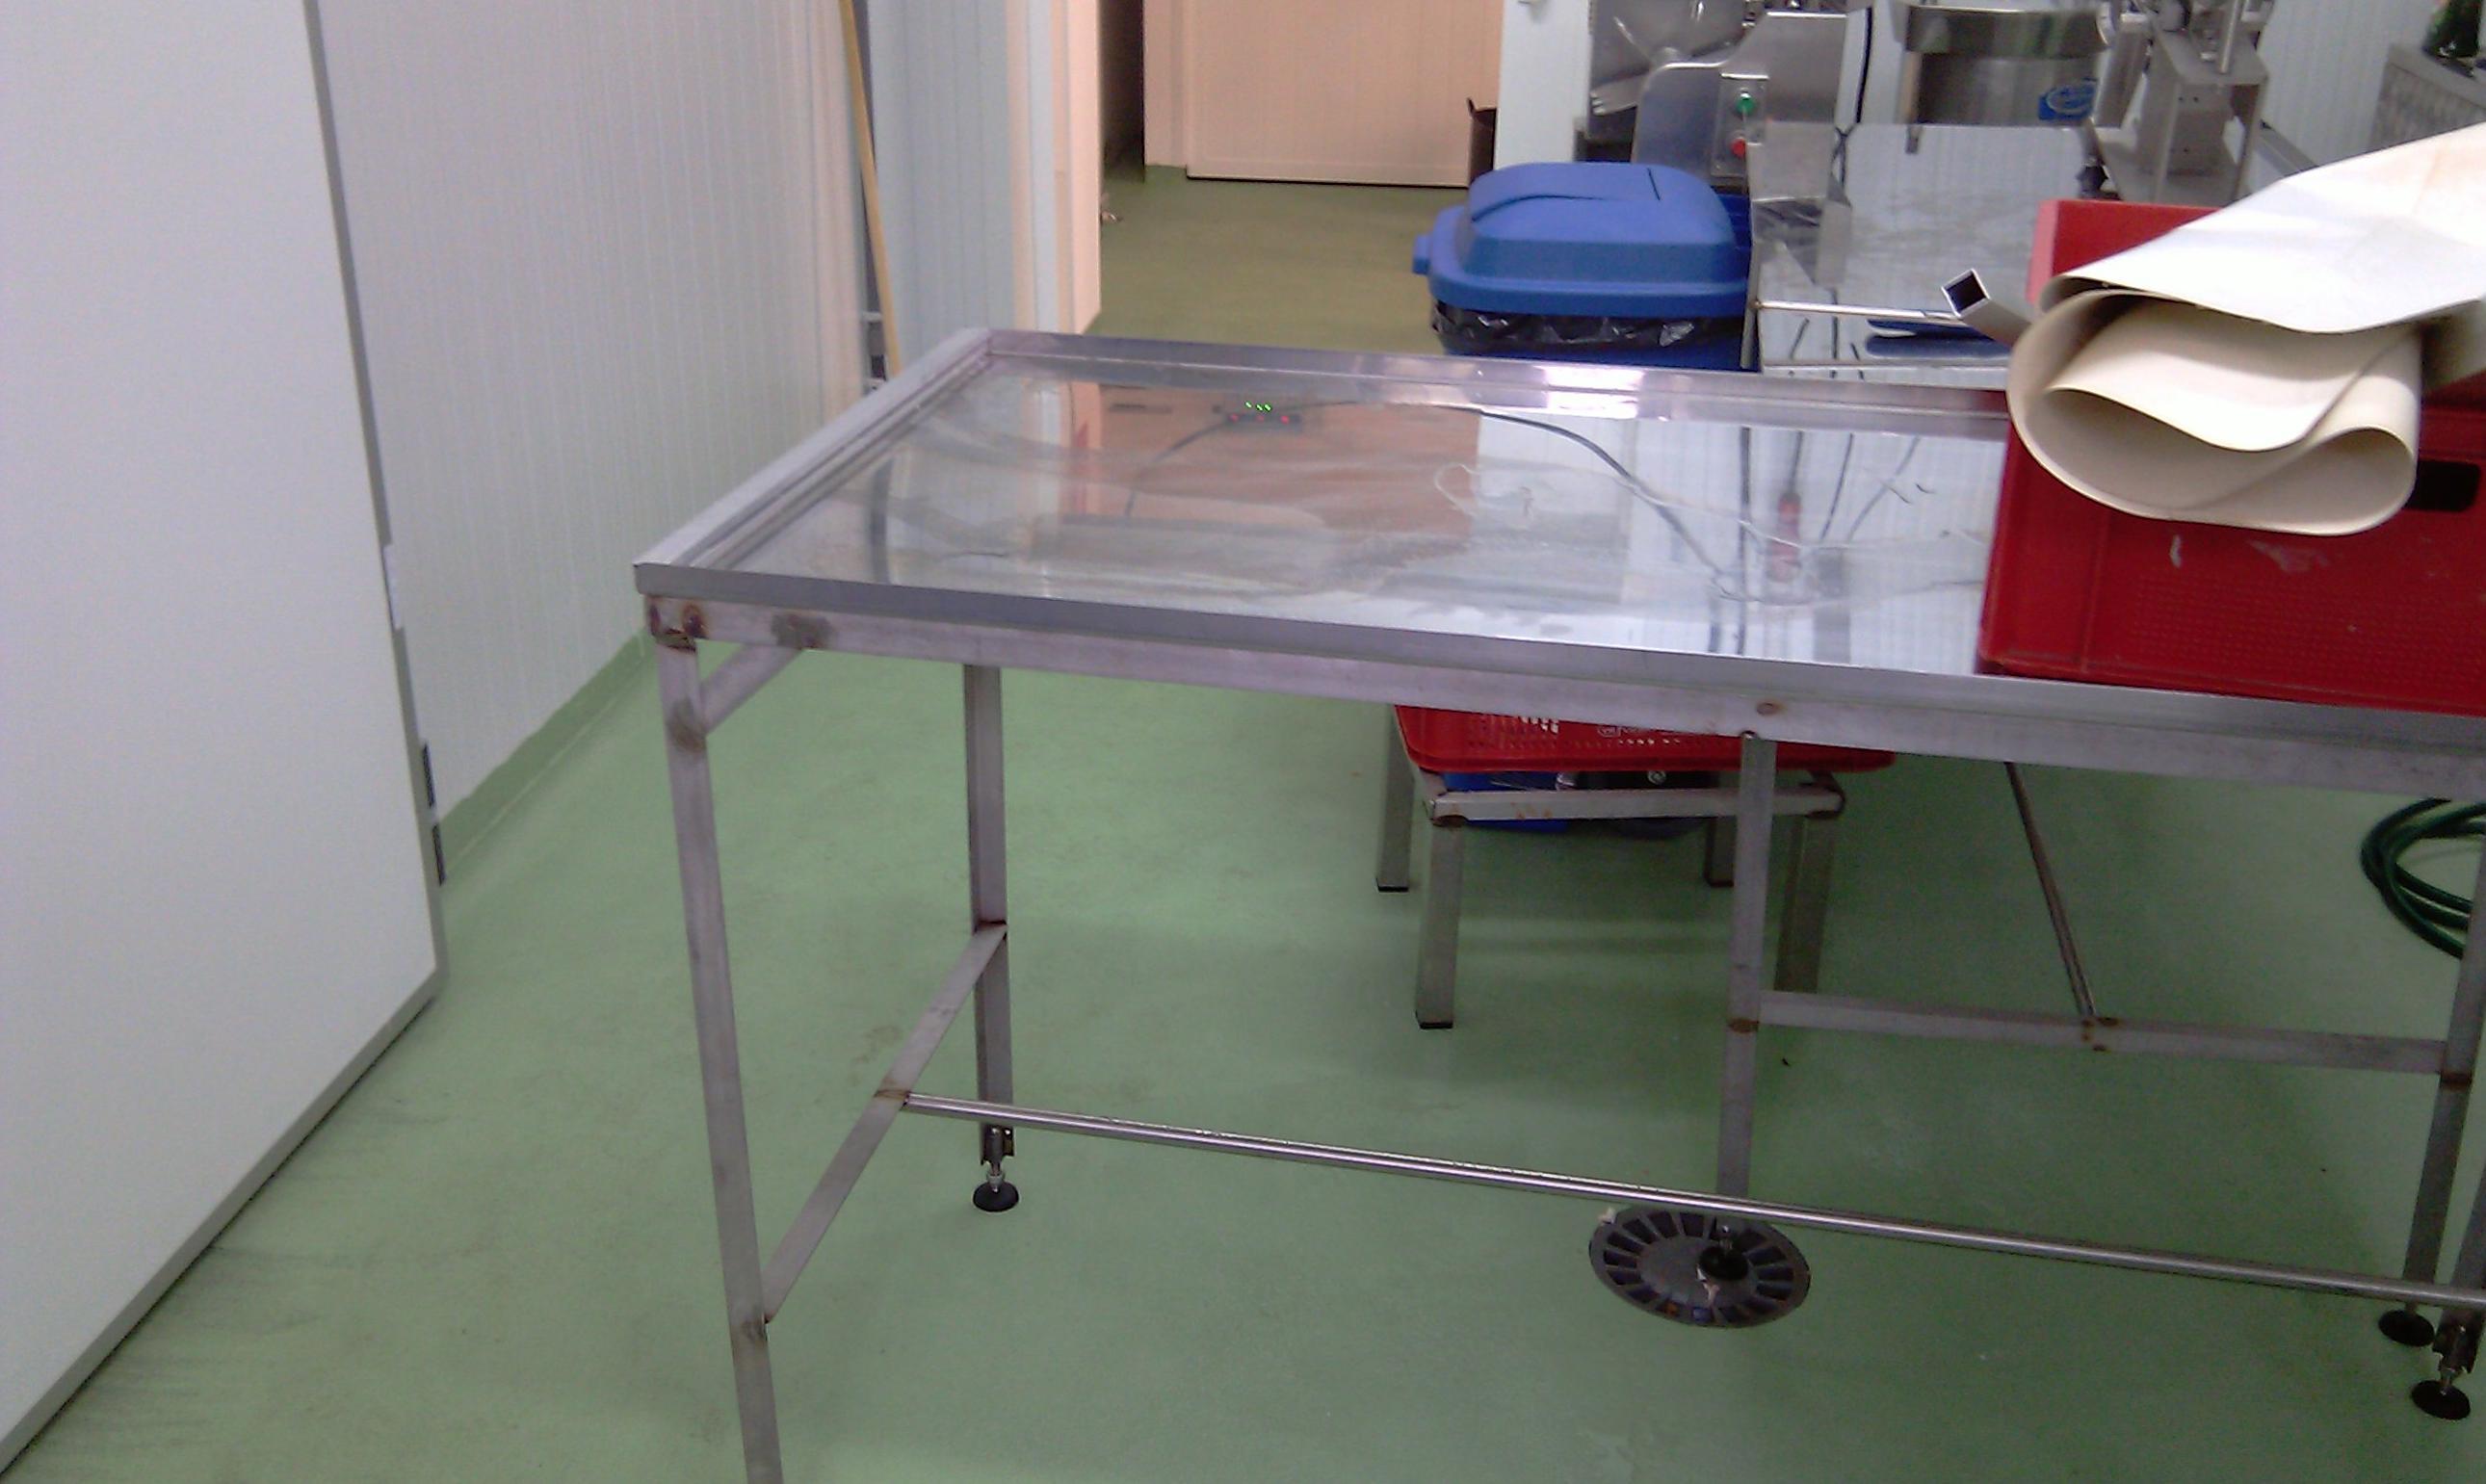 Suelo de carniceria con pavimento sanitario aplicado. (estado posterior).